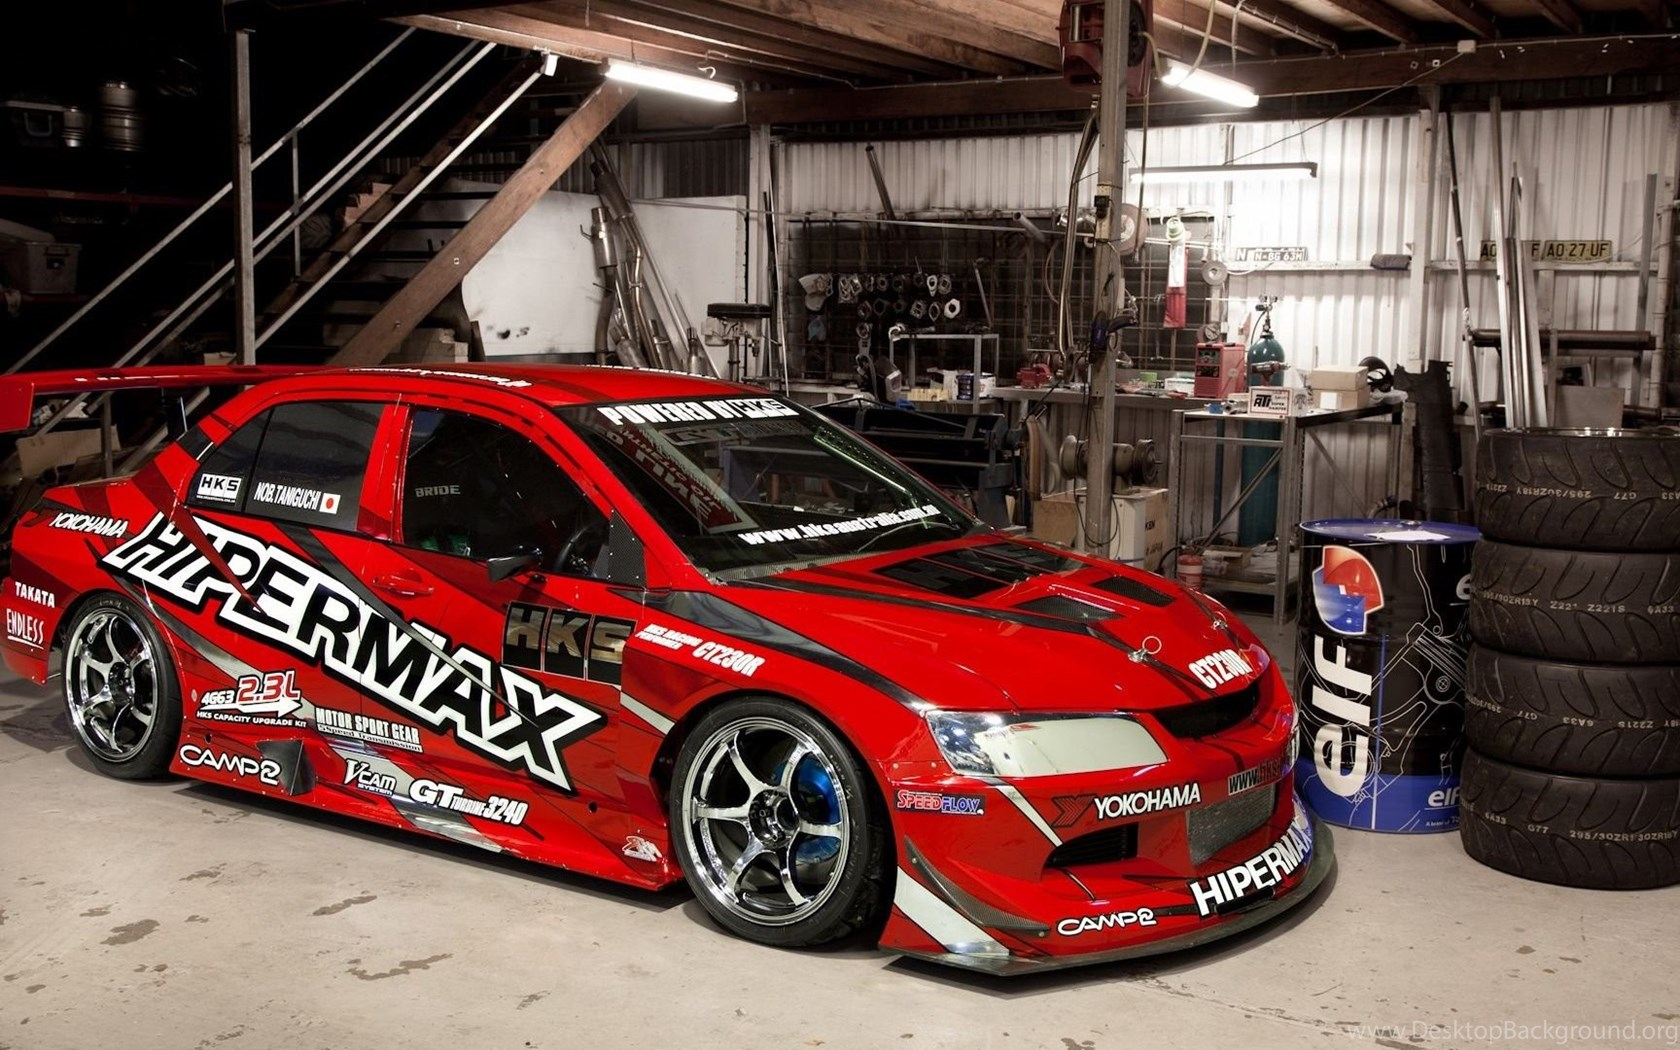 Mitsubishi Lancer Evolution In Garage Hd Wallpapers 1080p